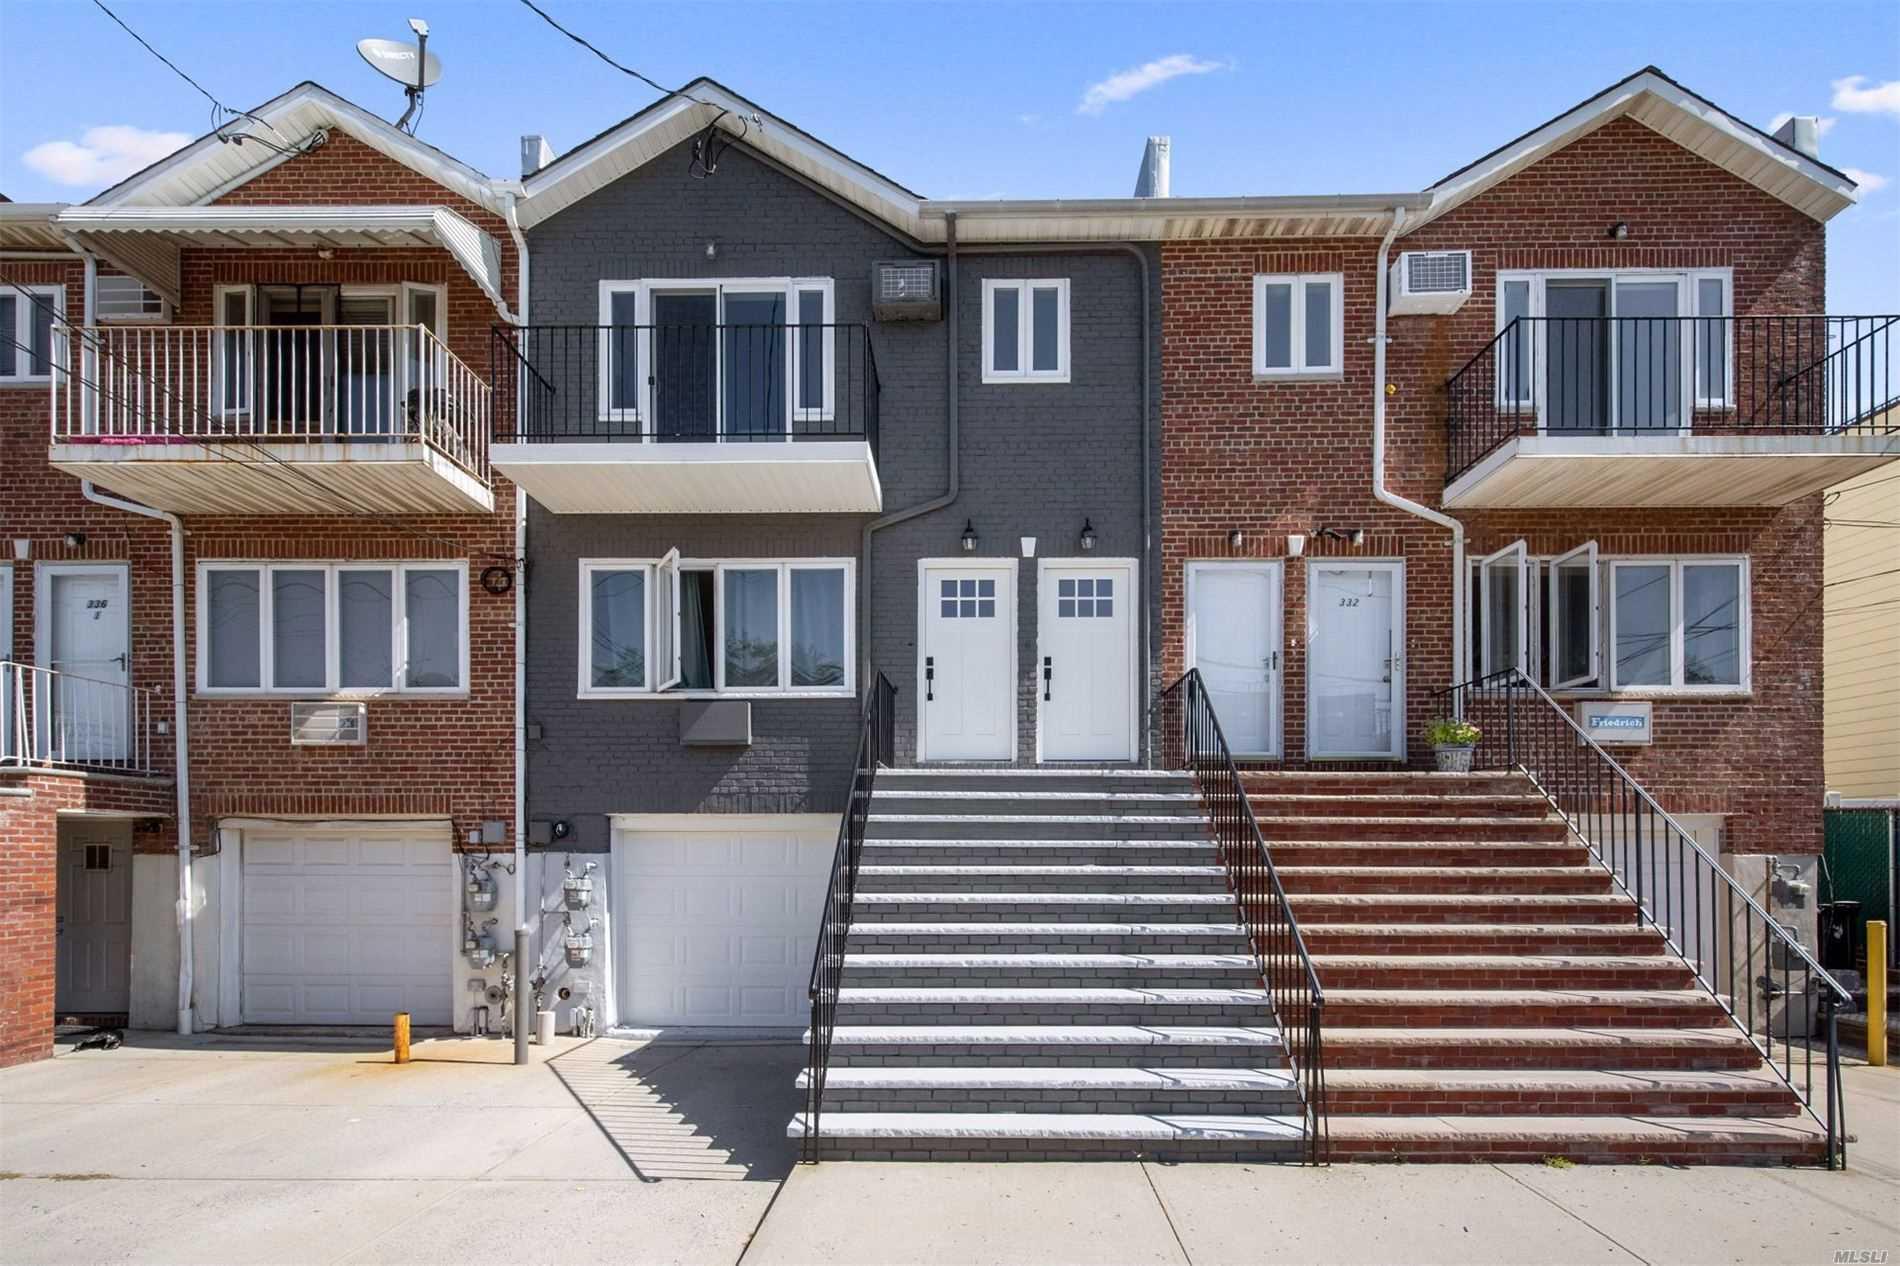 Property for sale at 334 Beach 102 Street, Rockaway Park NY 11694, Rockaway Park,  New York 11694